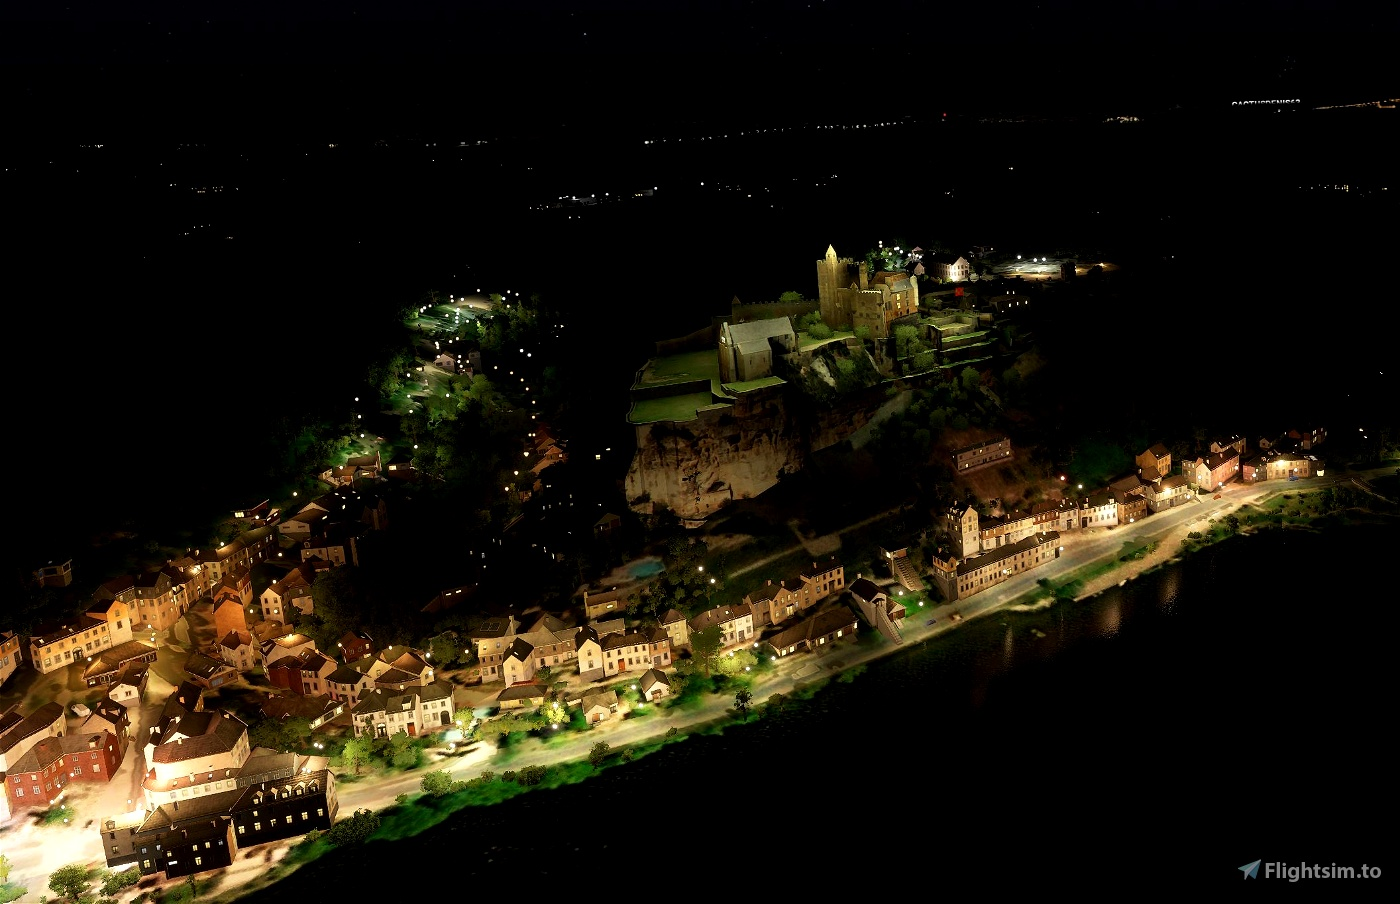 55 Castles in French Dordogne Flight Simulator 2020